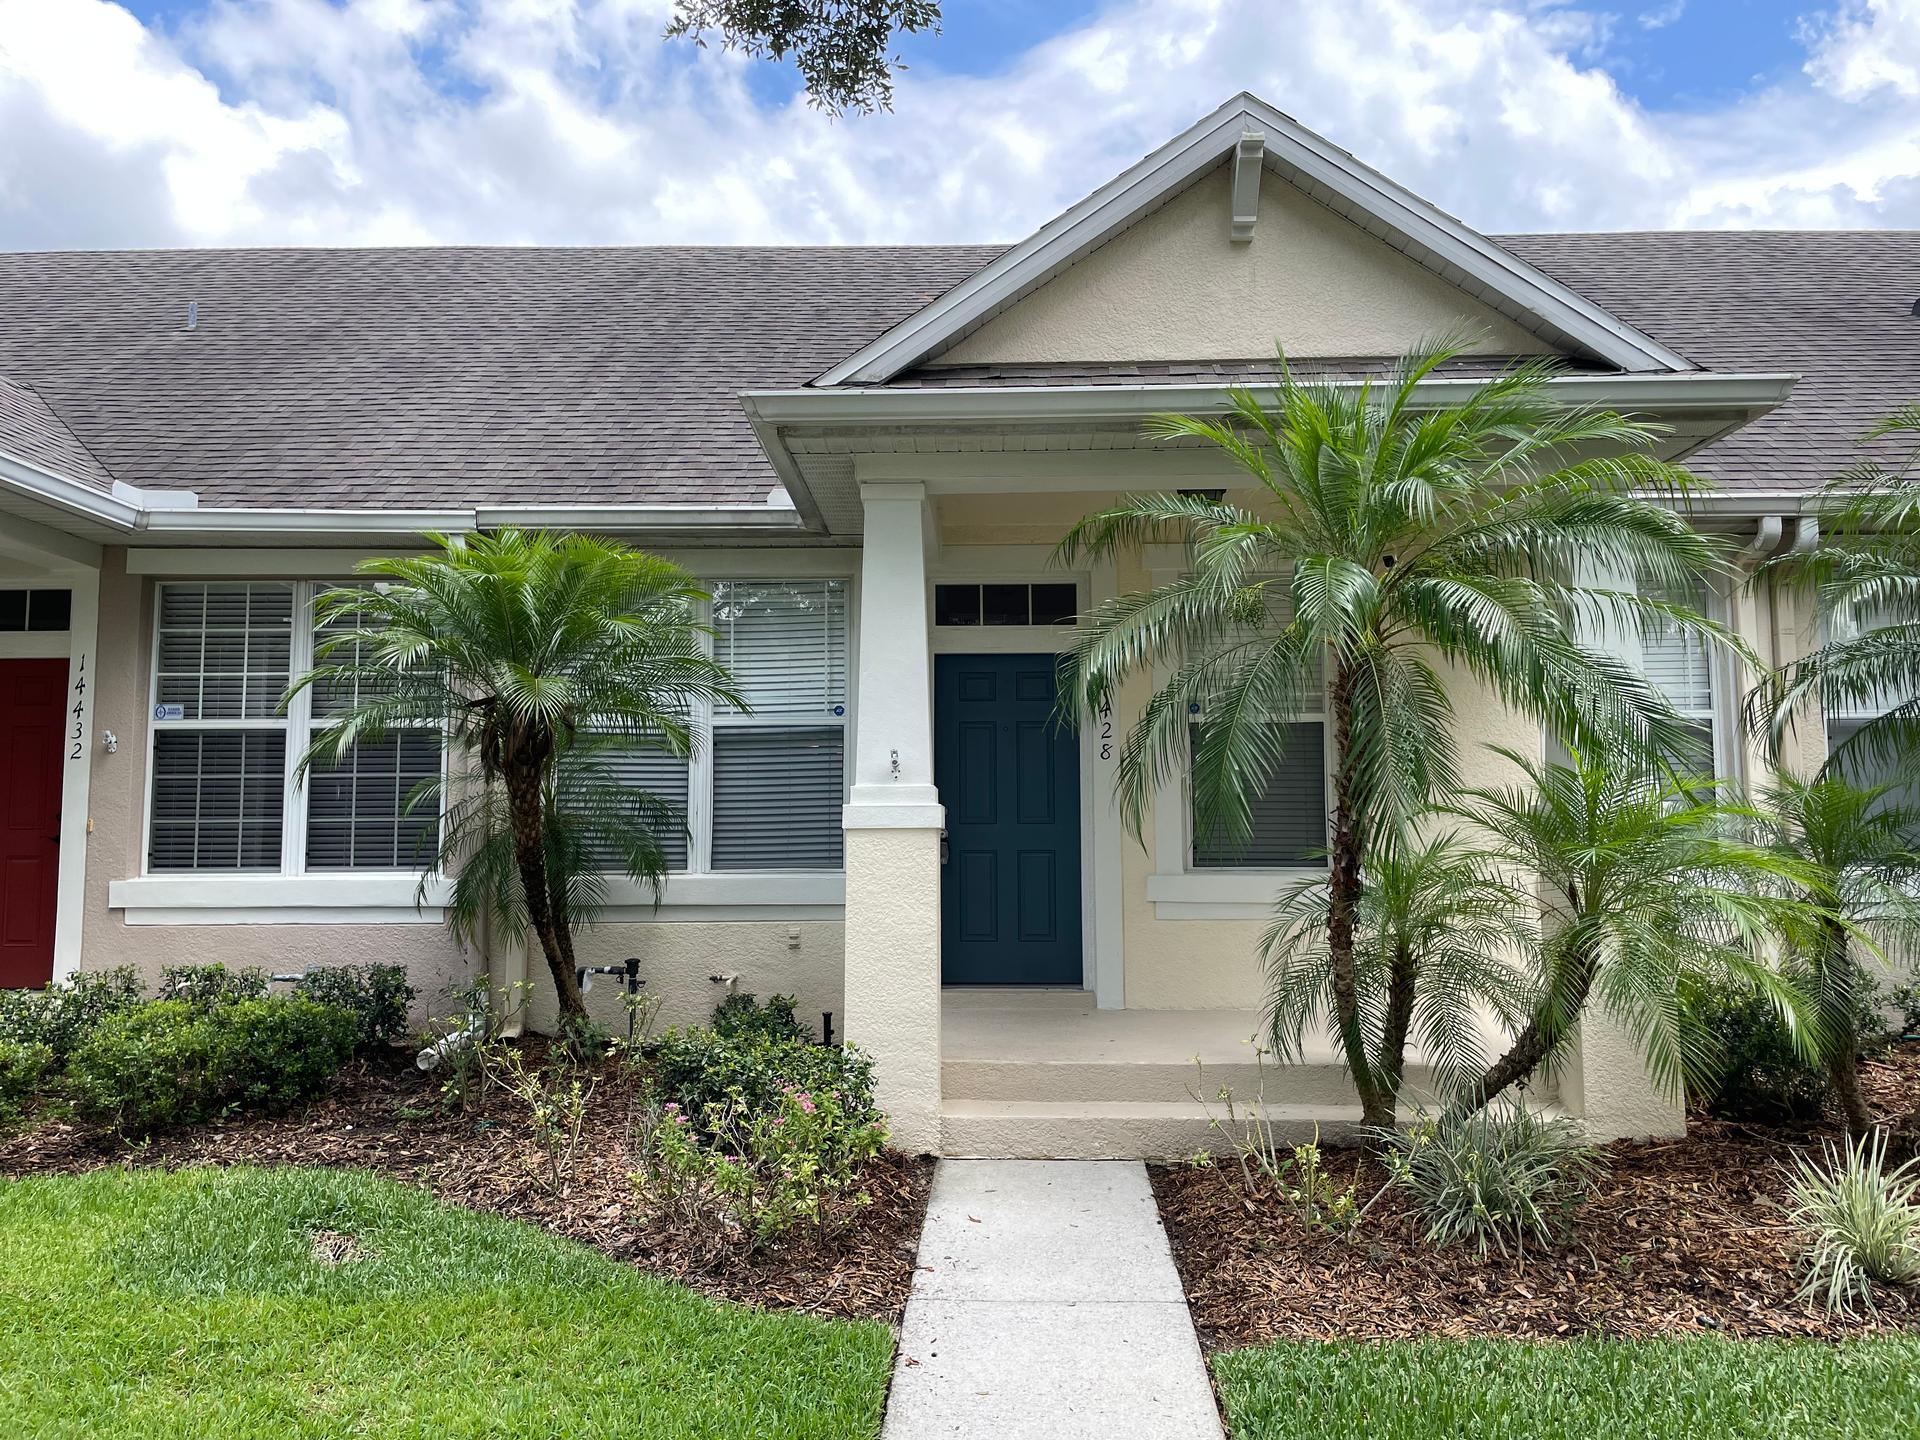 Photo of property: 14428 Chinese Elm Drive Orlando, FL 32828